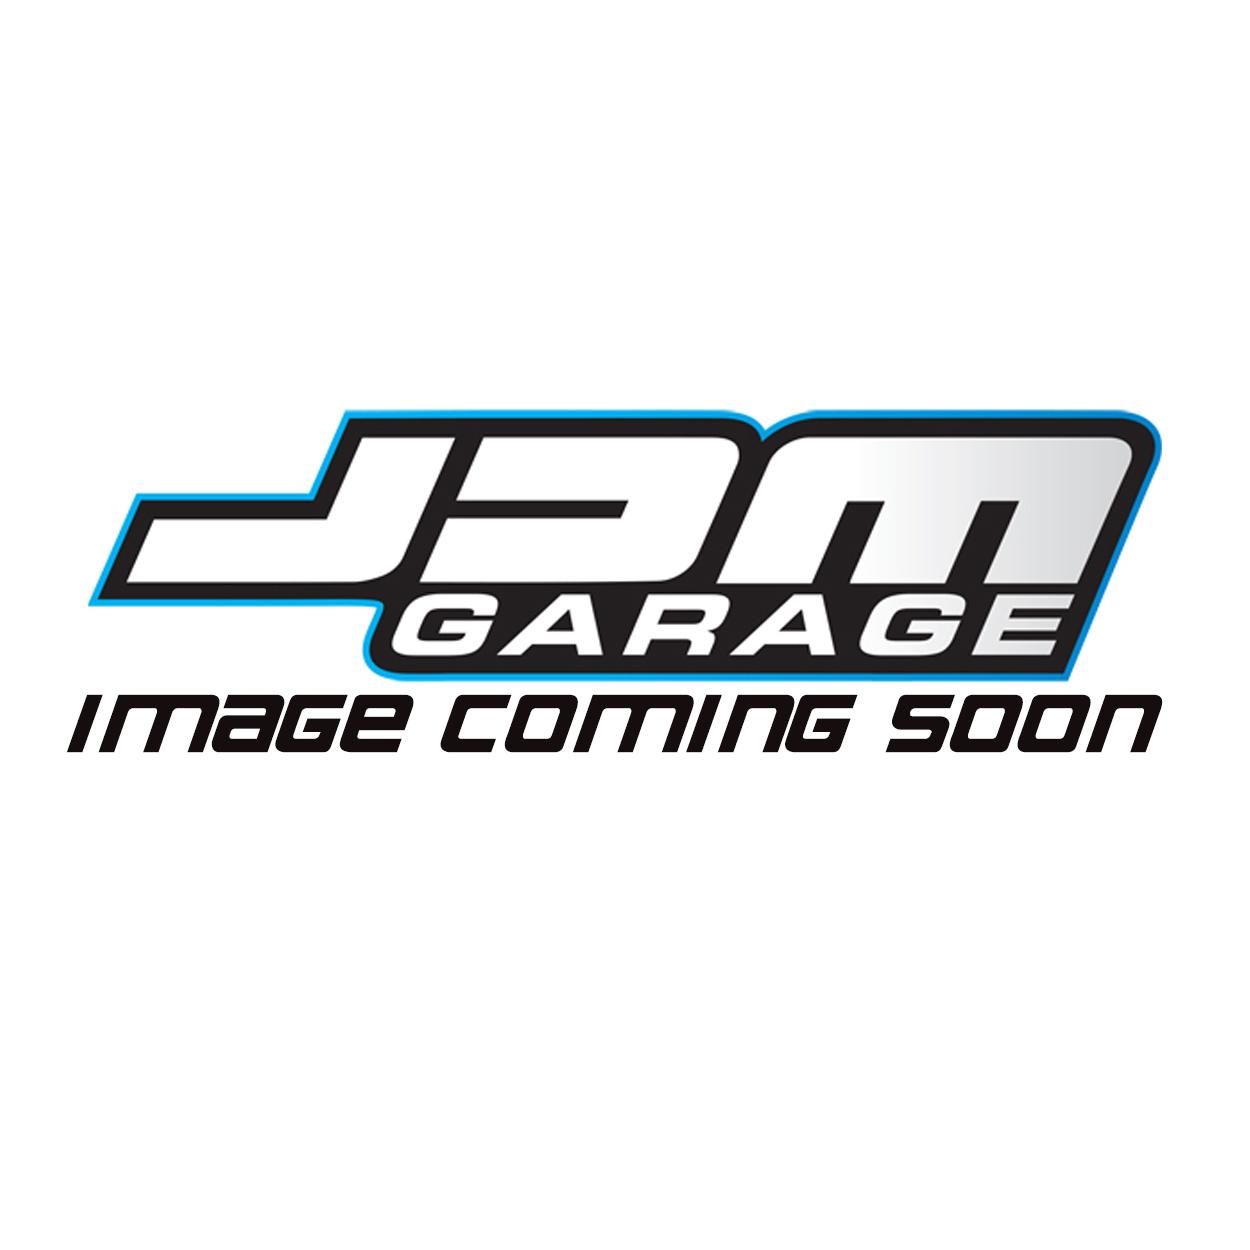 JDMGarageUK Pink & Gold Sticker